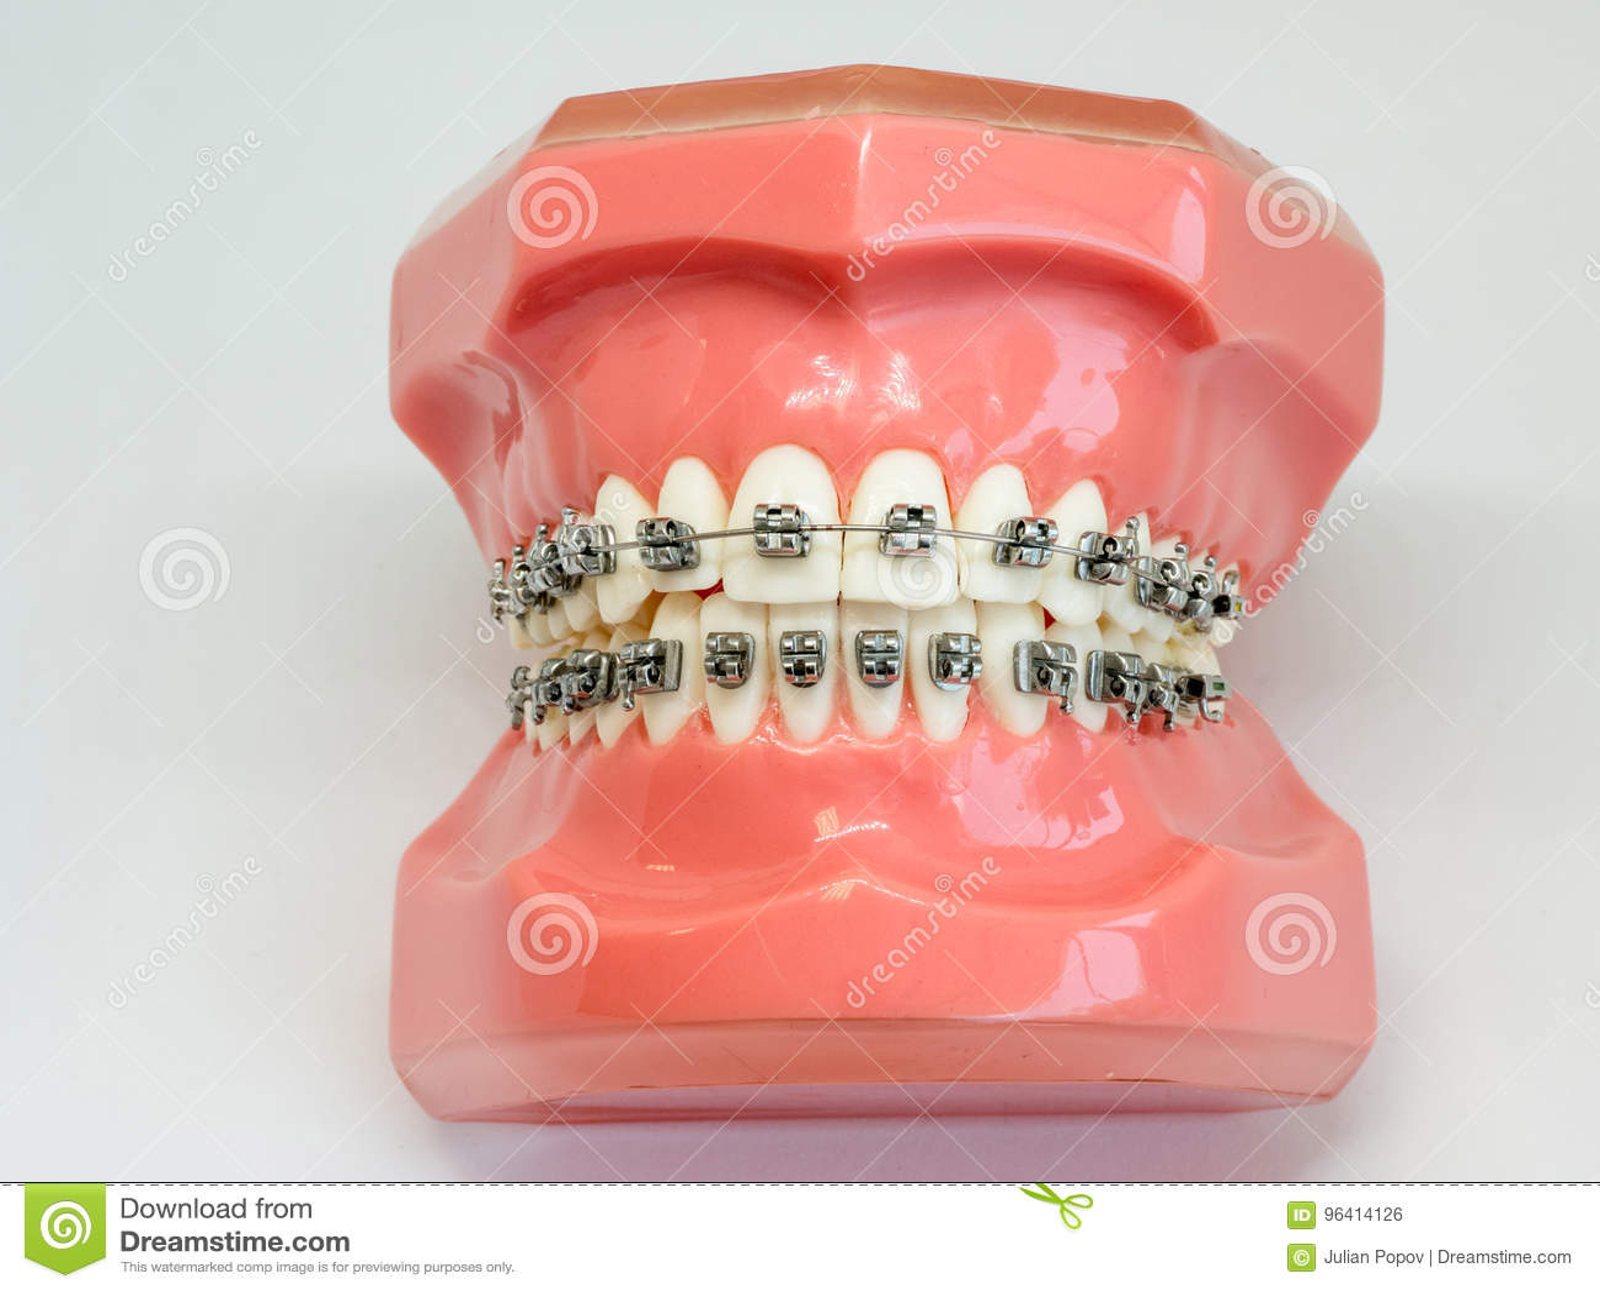 Modelo artificial da maxila humana com as cintas coloridas do fio unidas